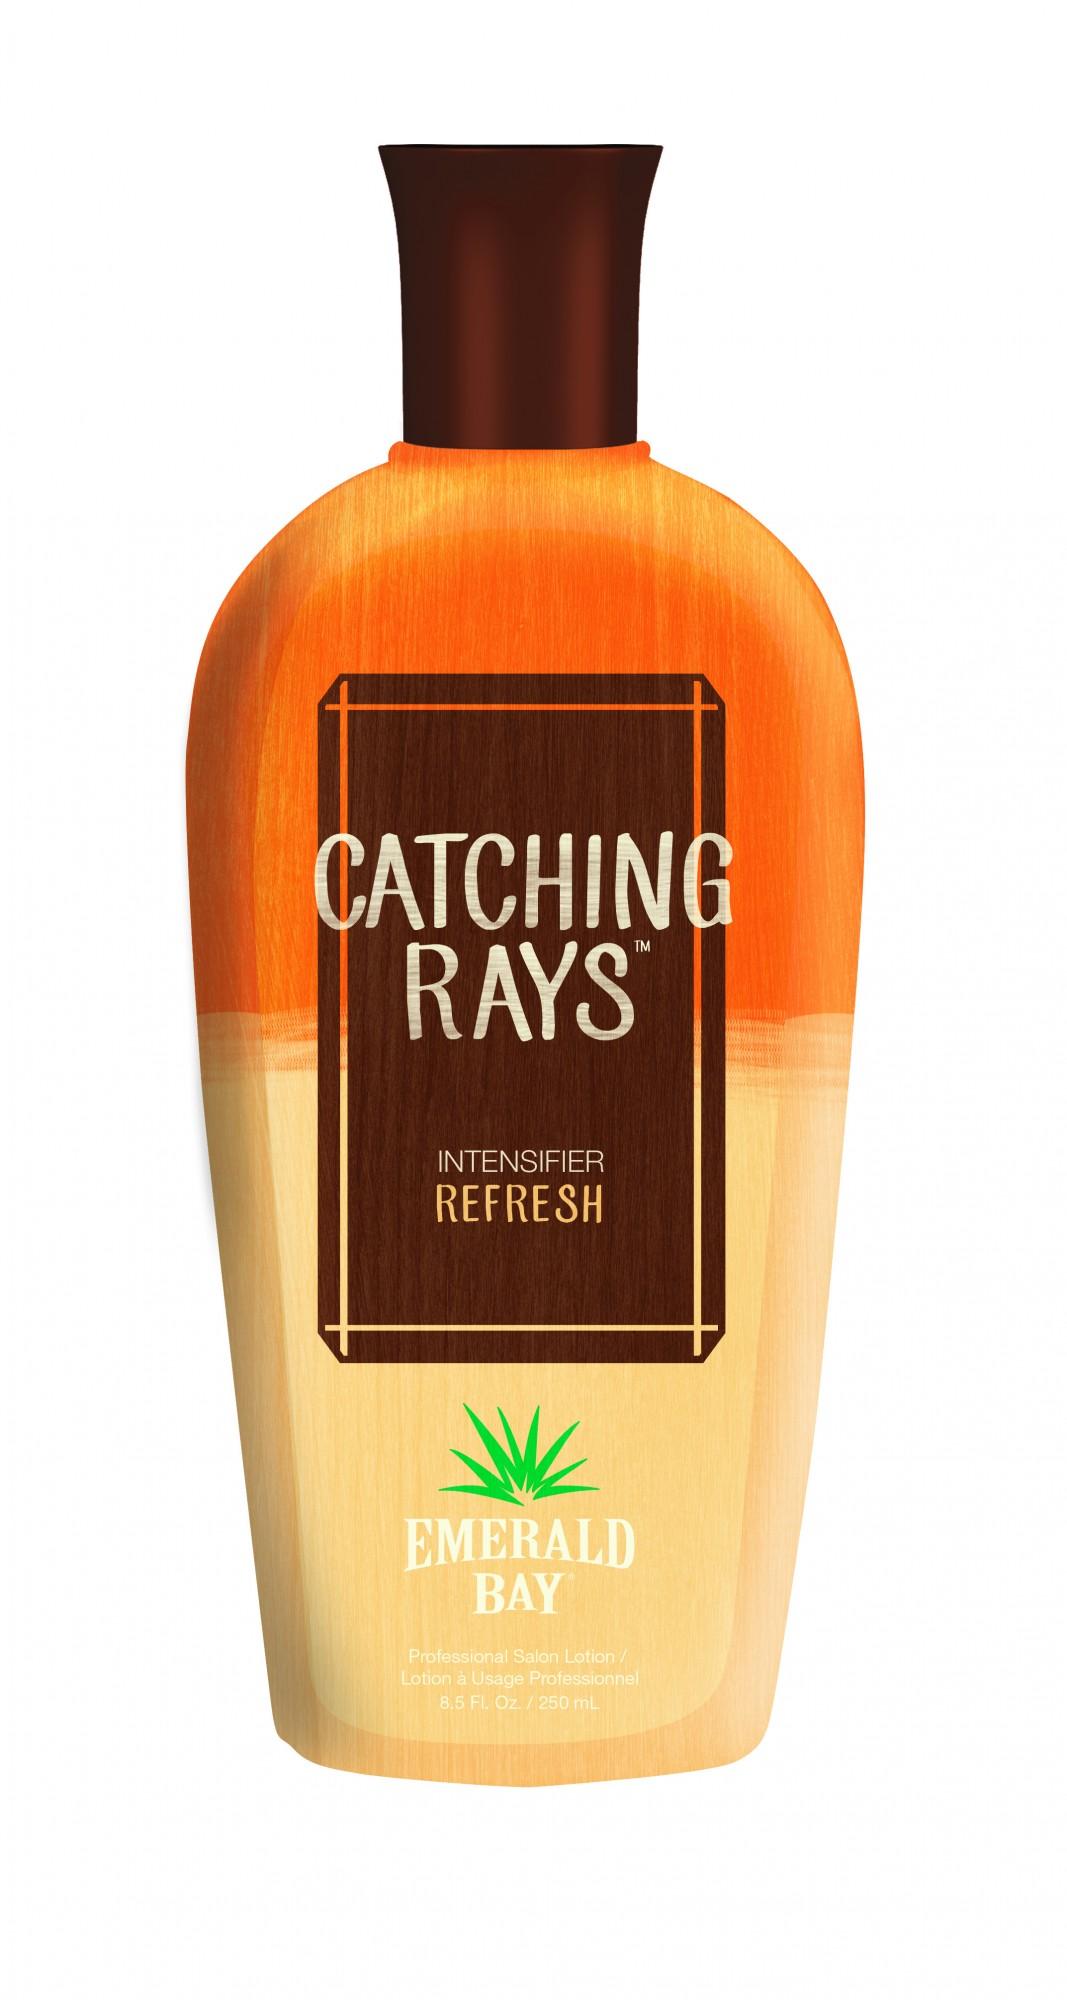 Catching Rays Intensifier Refresh